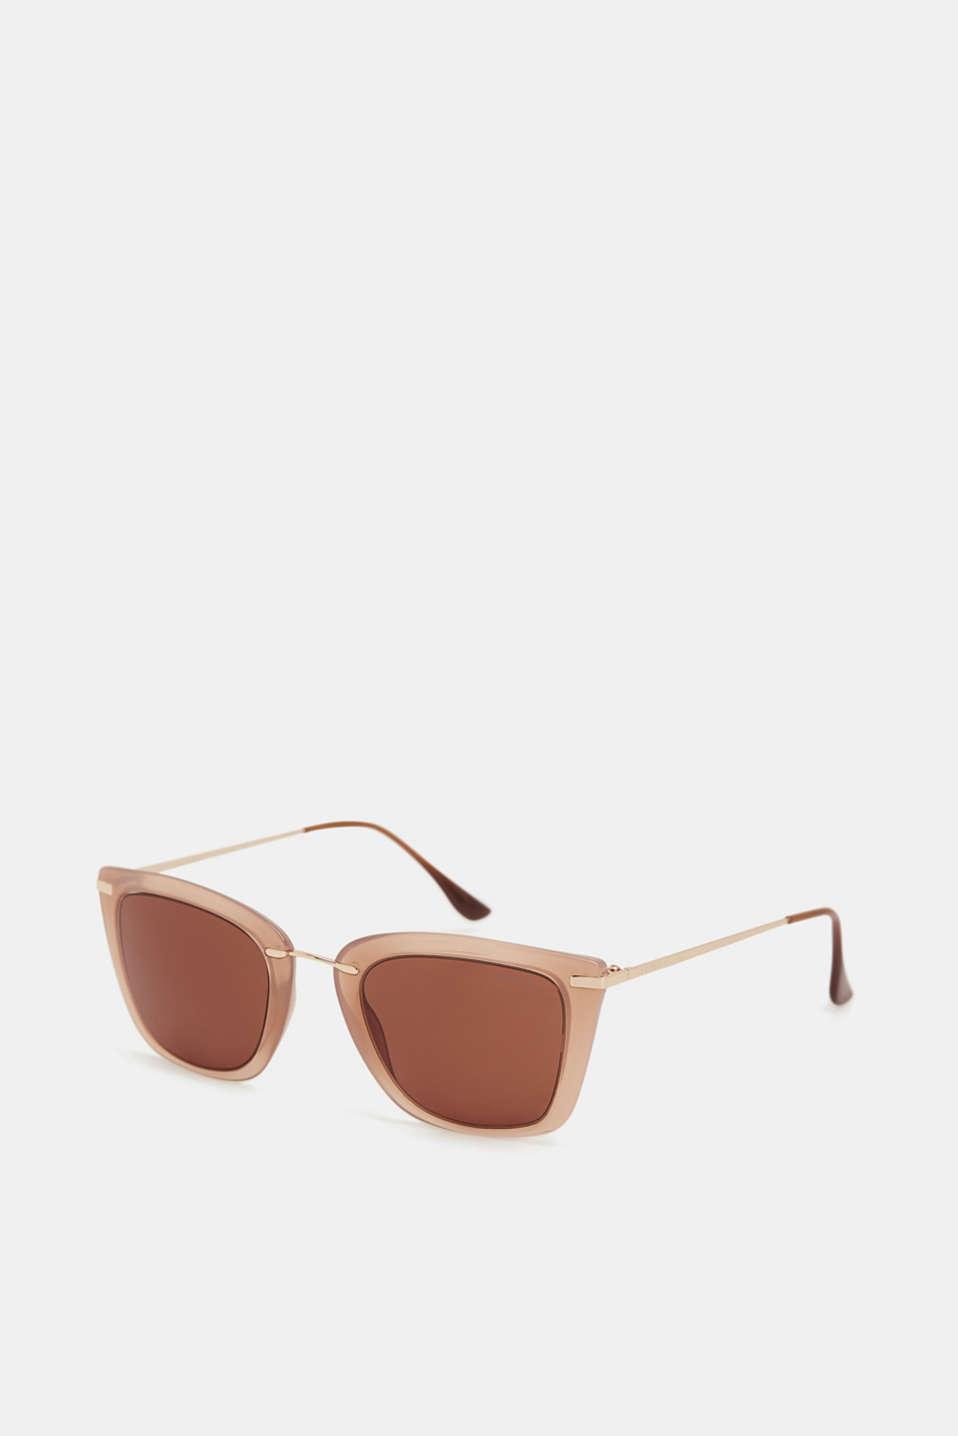 Fine wire frame sunglasses, BEIGE, detail image number 0